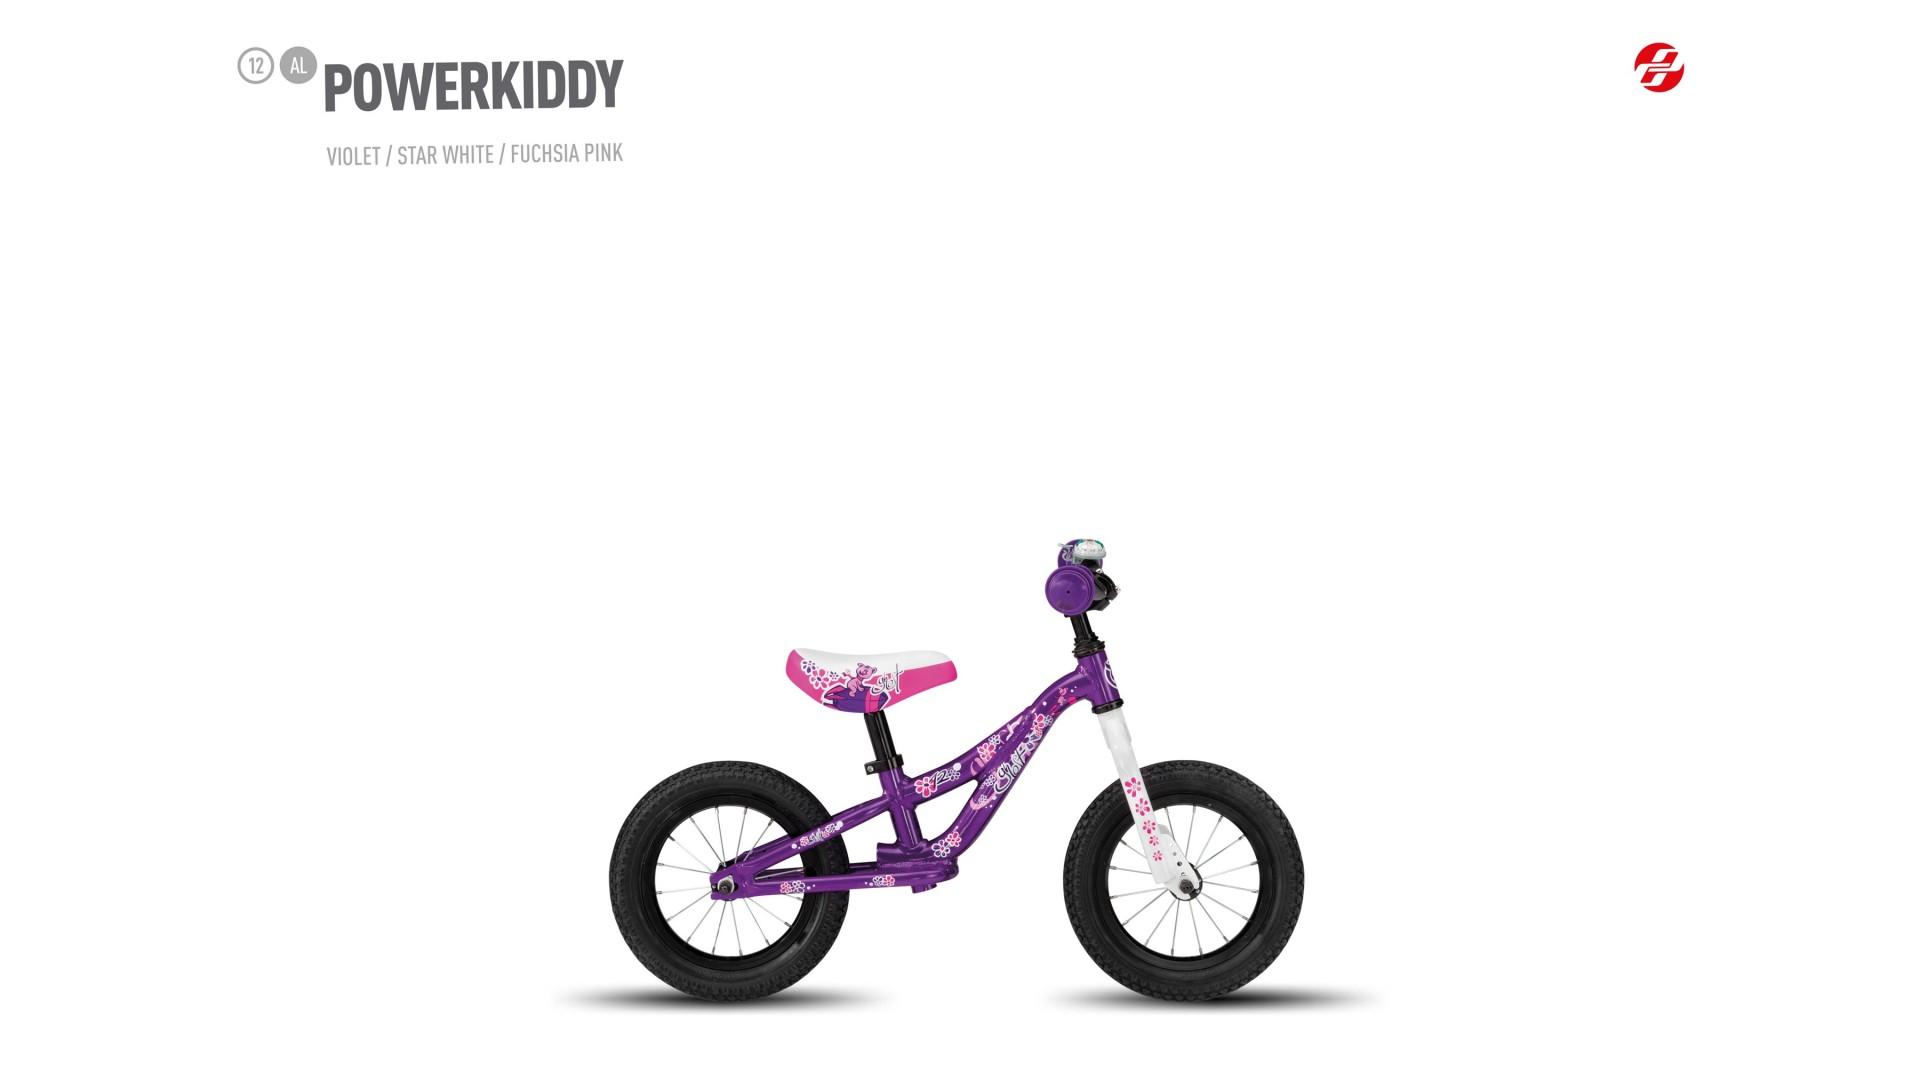 Велосипед GHOST Powerkiddy 12 AL violet/starwhite/fuchsiapink год 2017